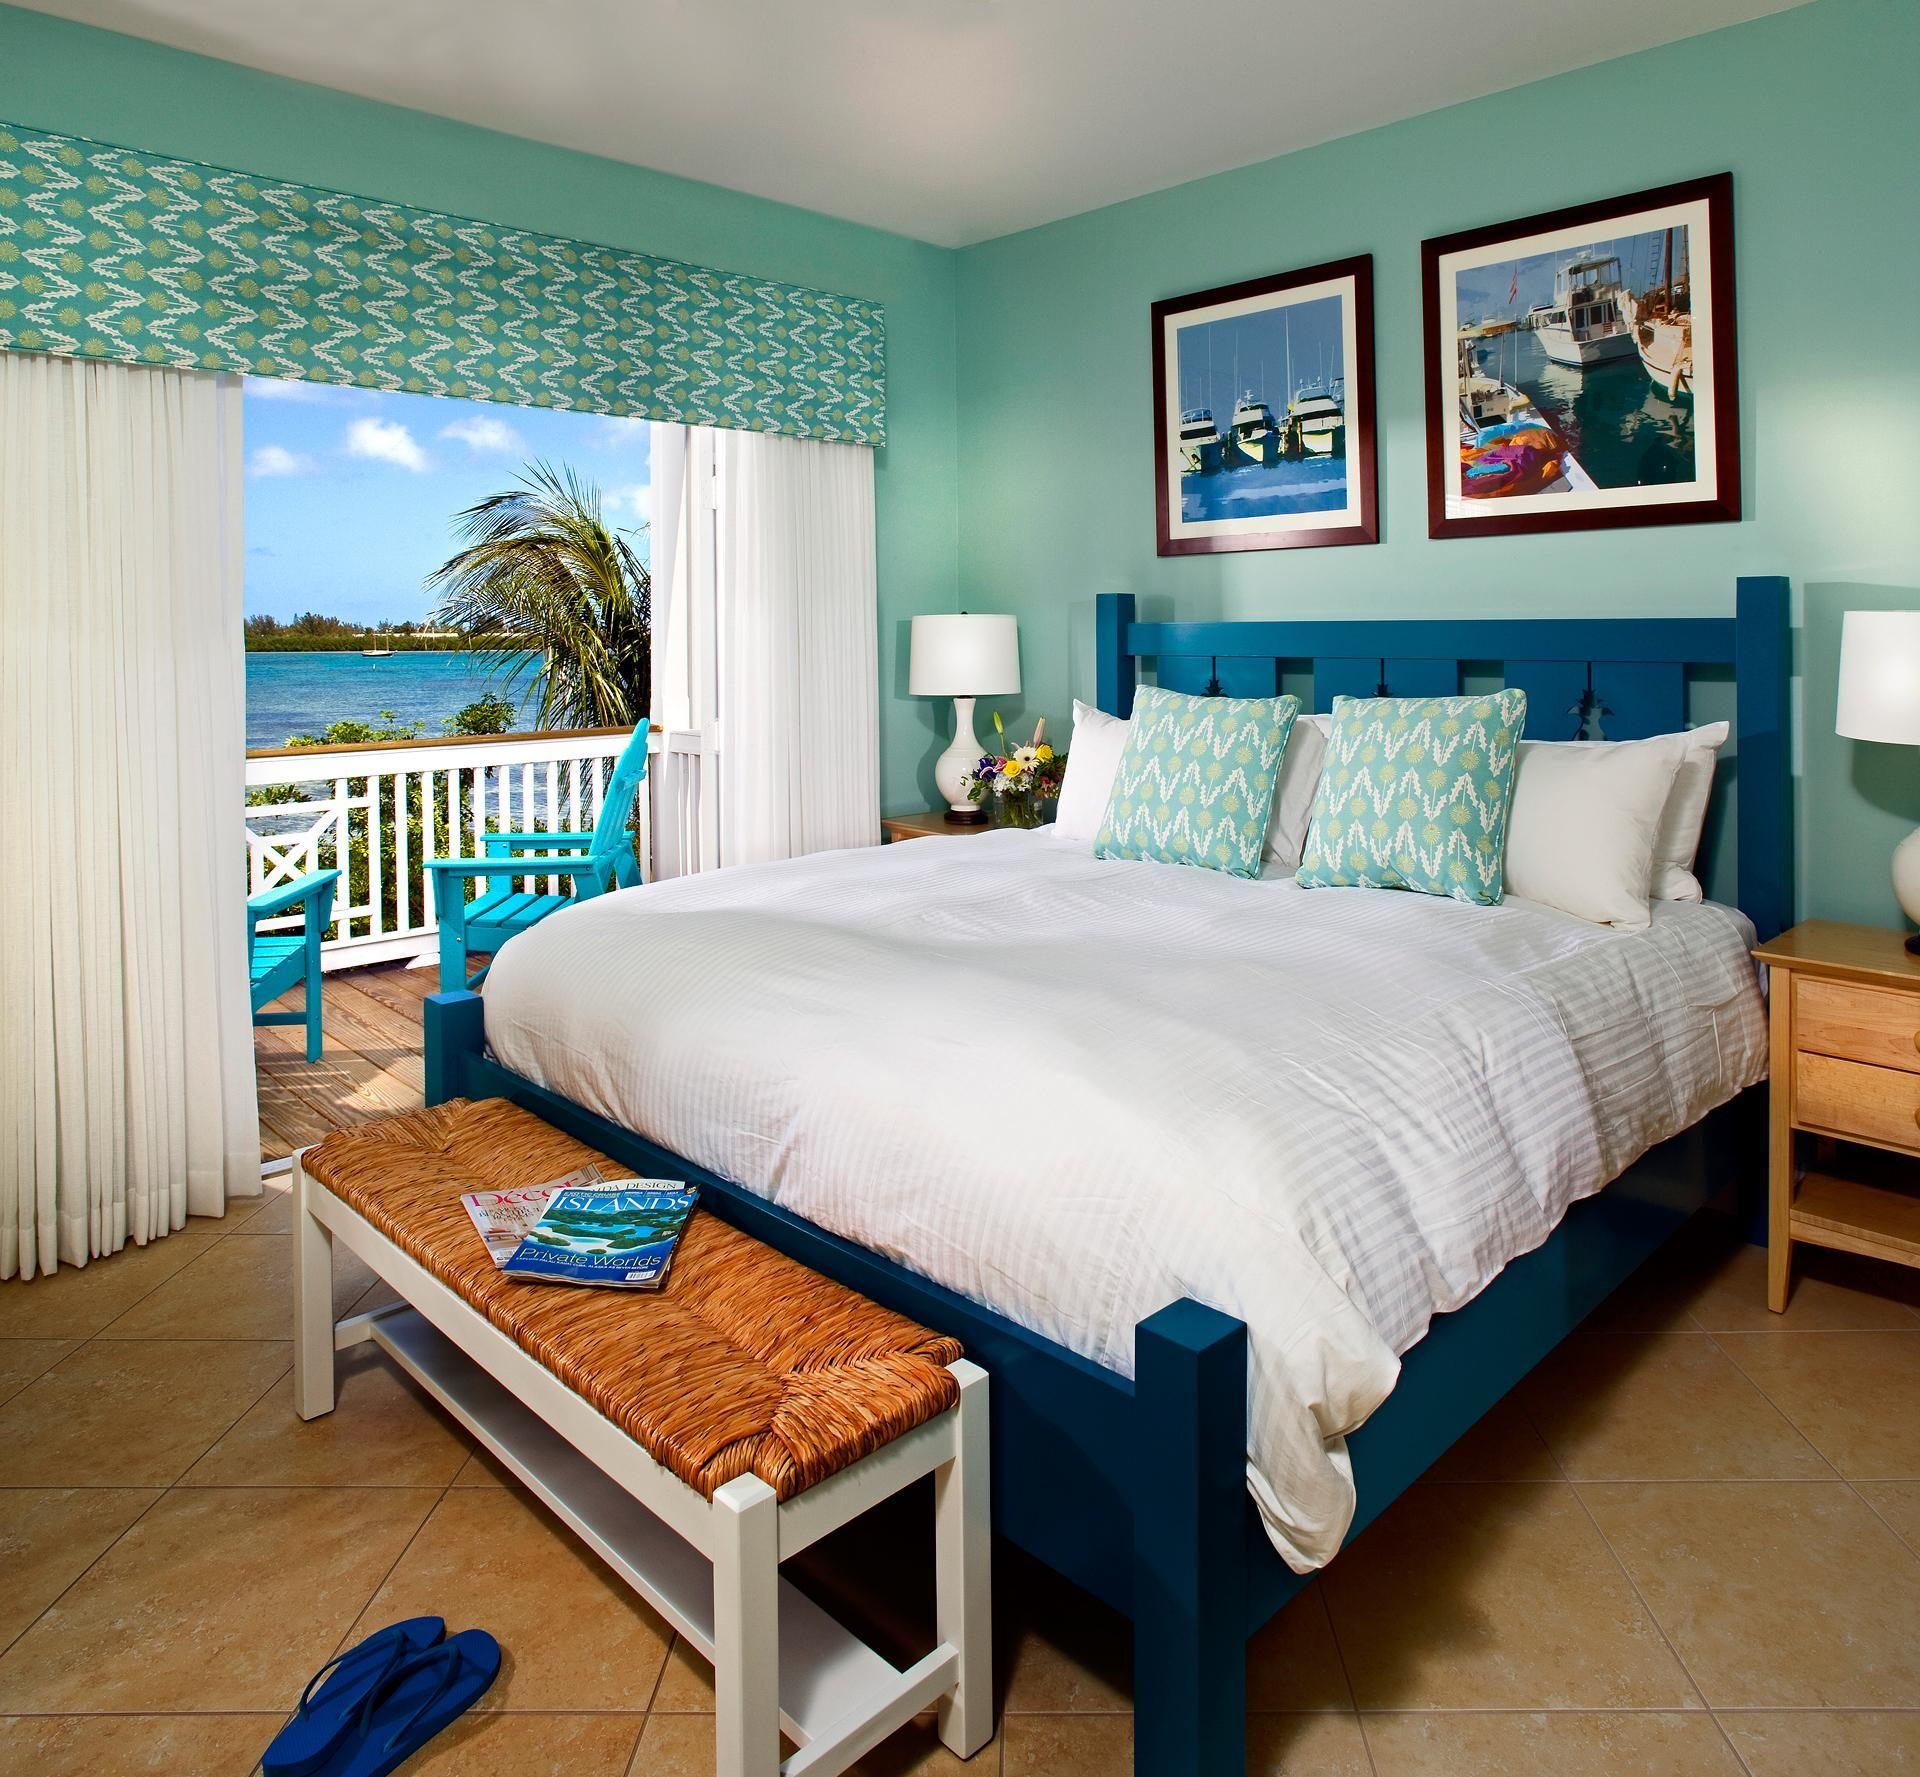 Key West Boutique Hotel  Parrot Key Resort  Hospitality